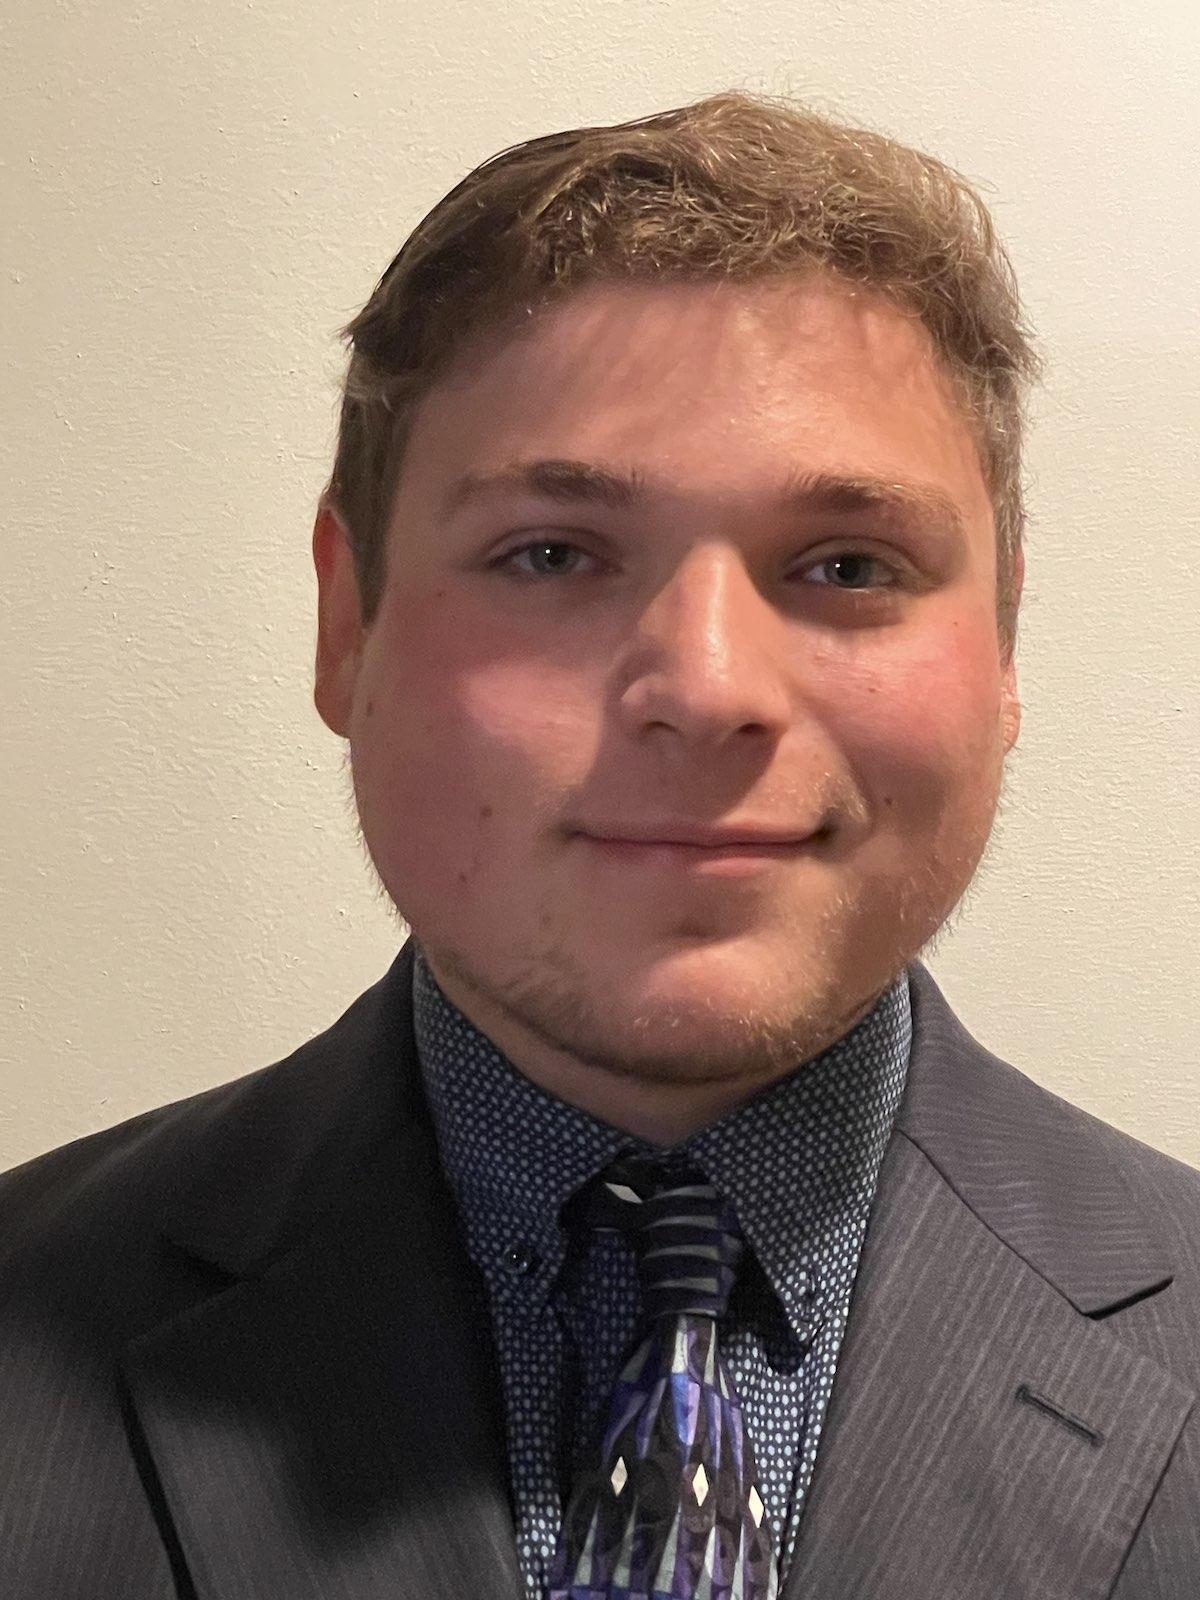 Veriheal Innovation in Cannabis Scholarship 2021 Winner Matthew Vogel